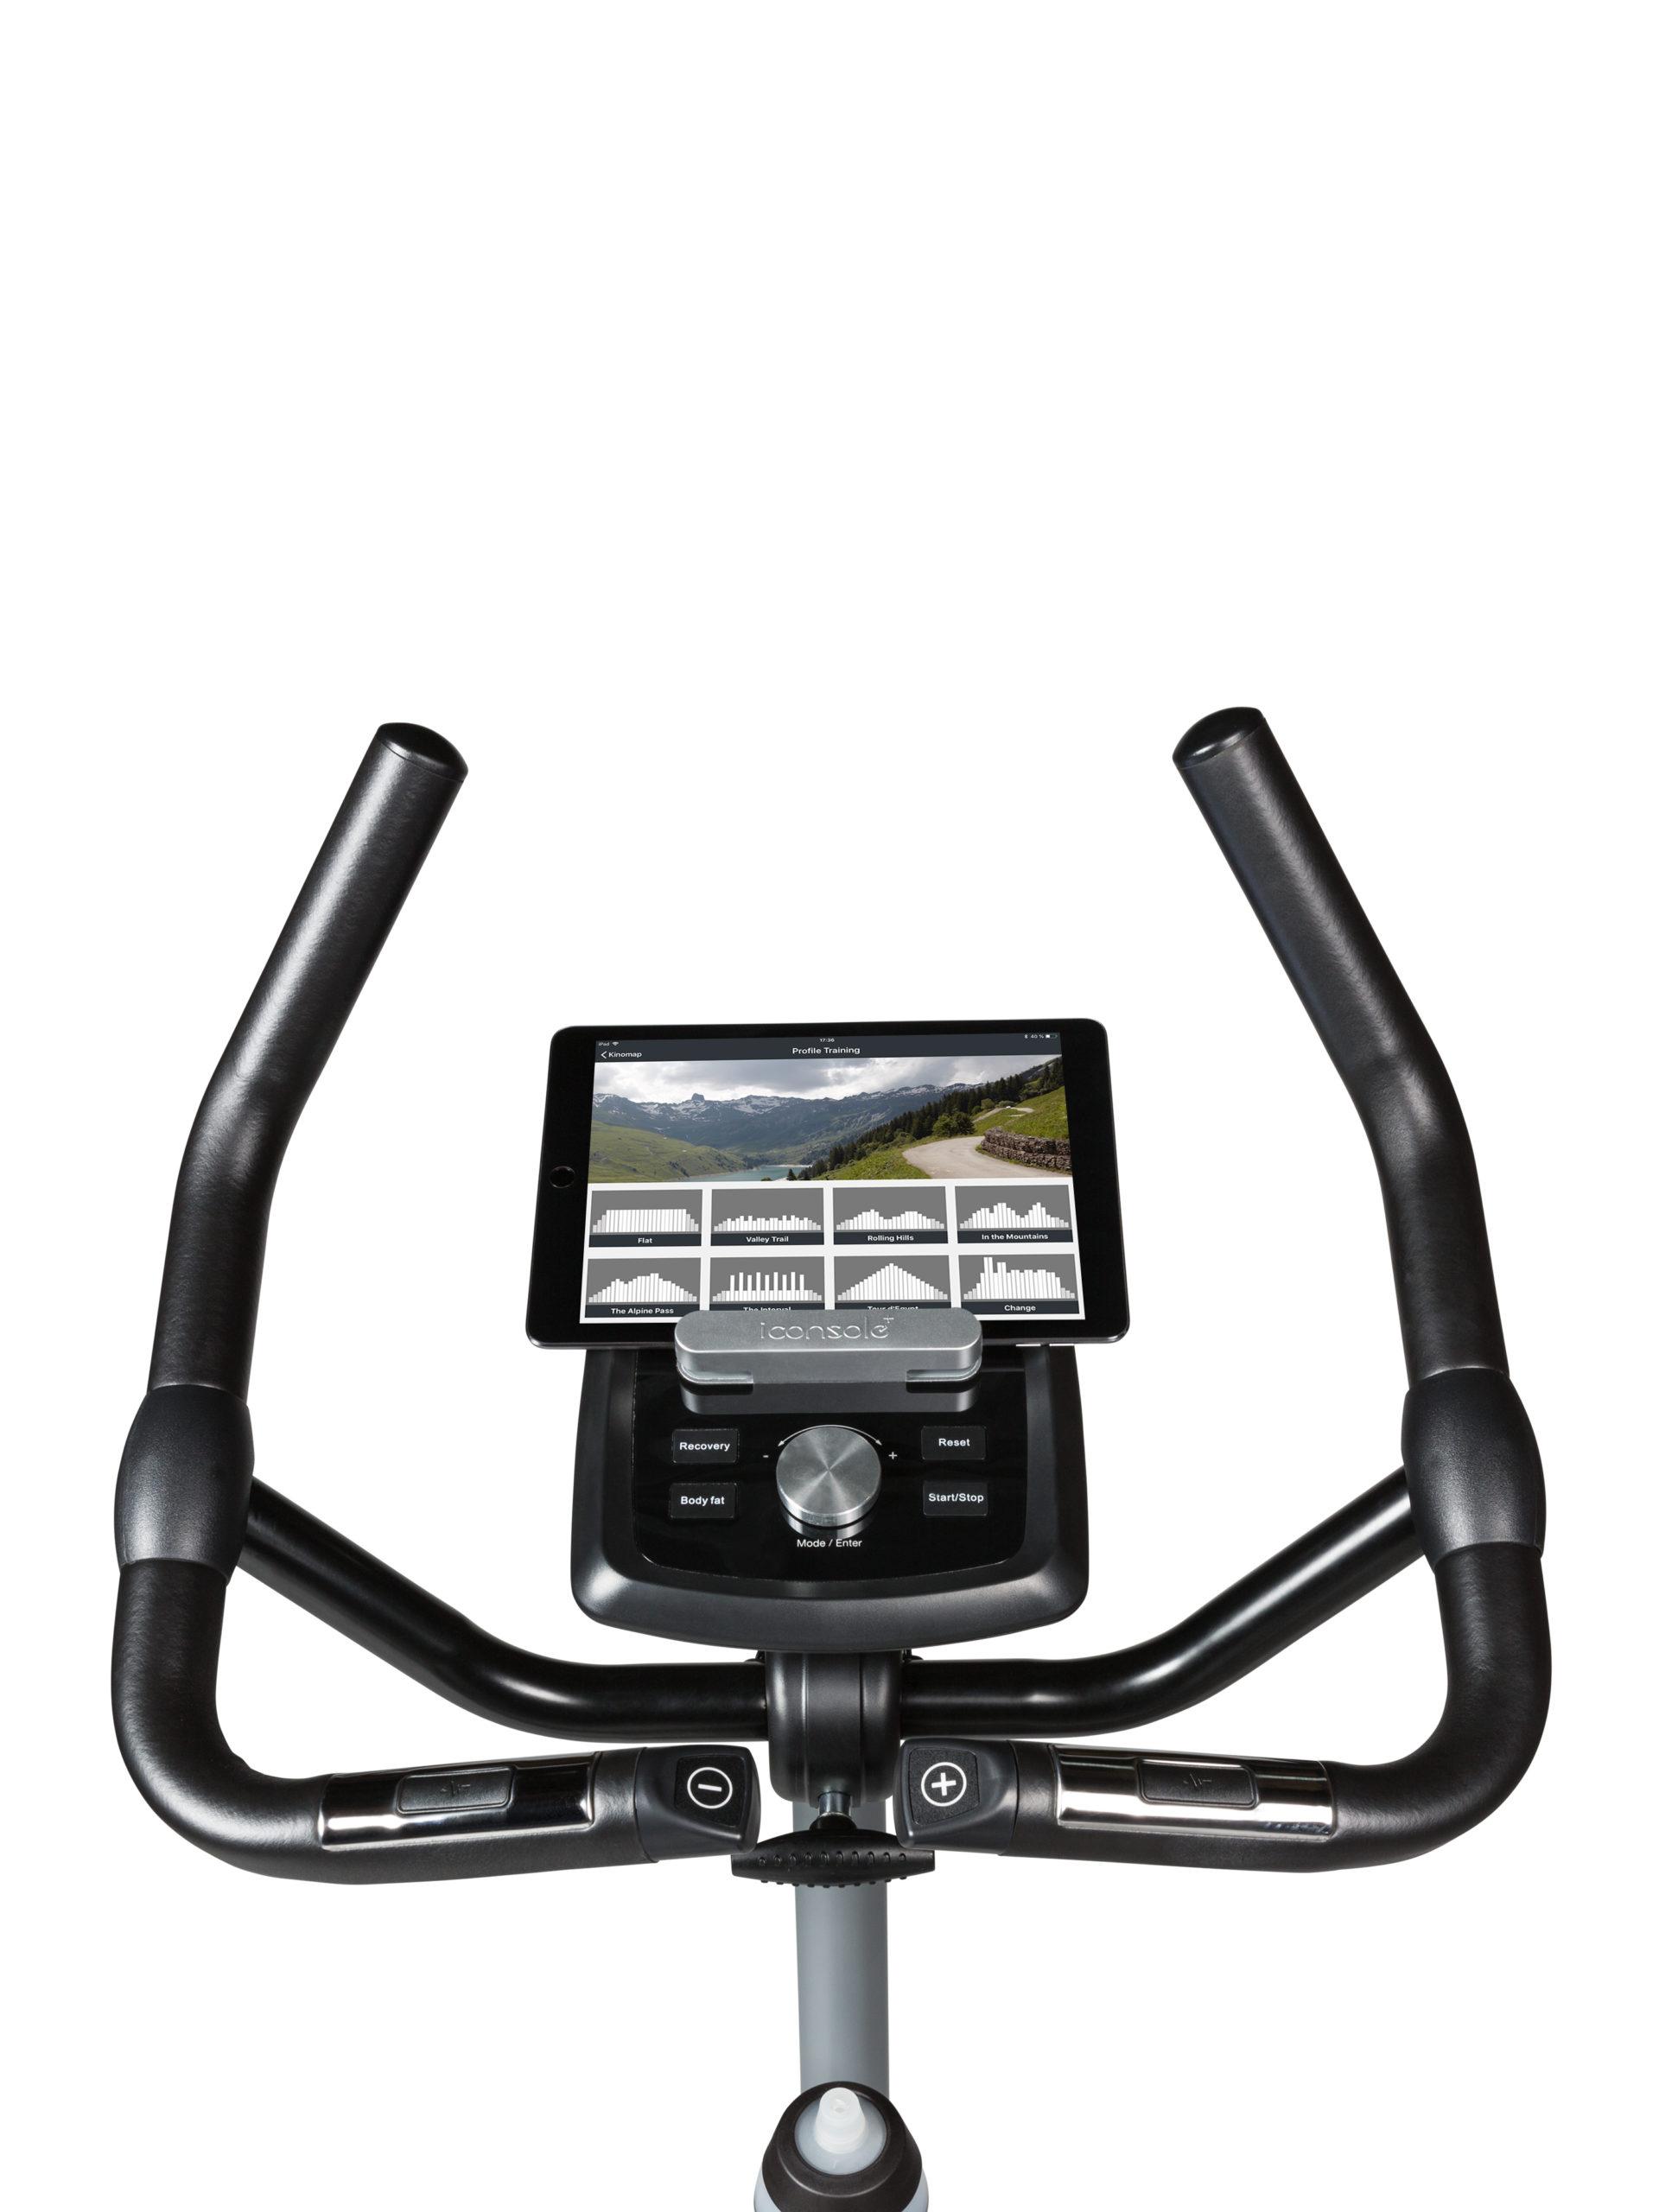 Flow Fitness Tabel Turner DHT2000i Hometrainer 5